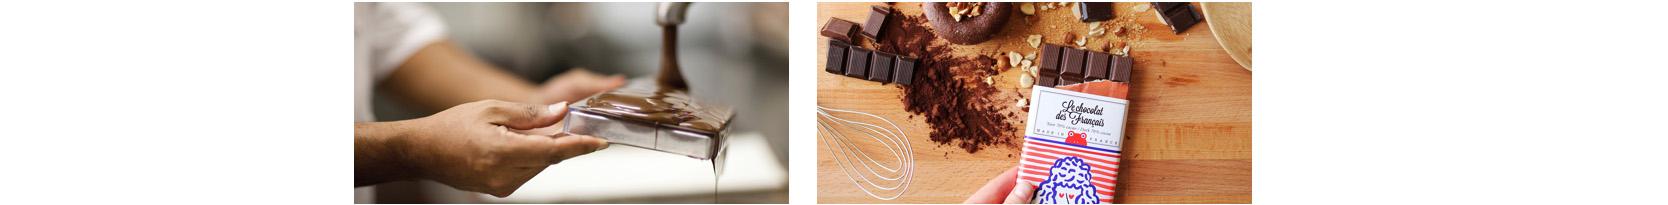 chocolat france